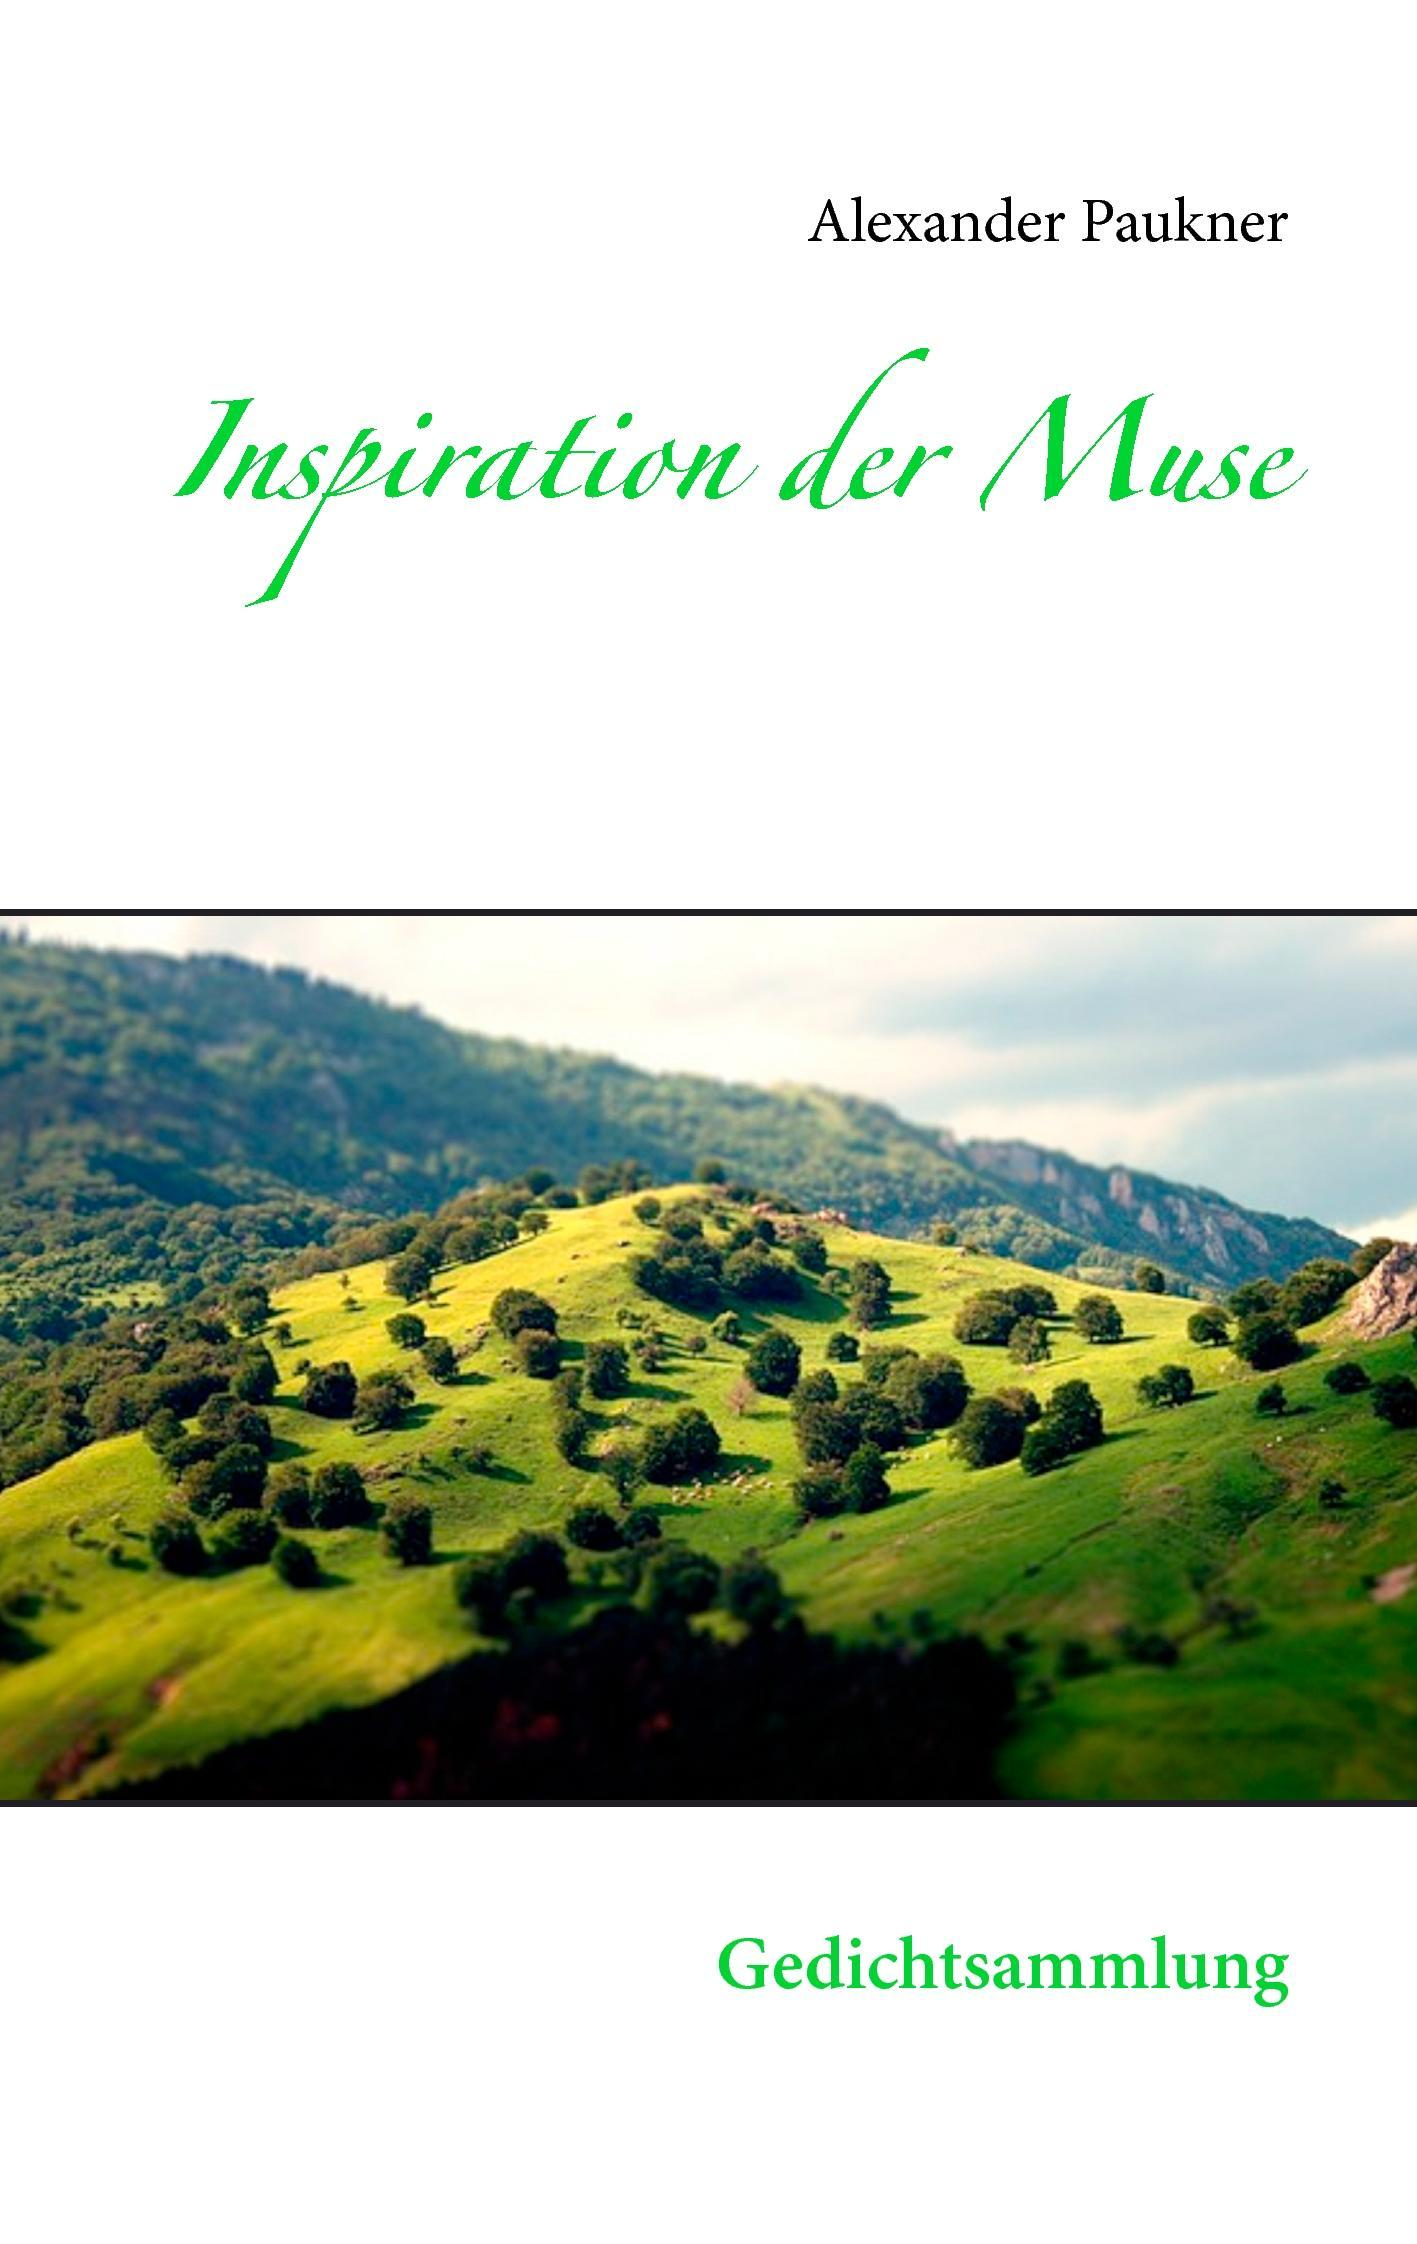 Inspiration der Muse